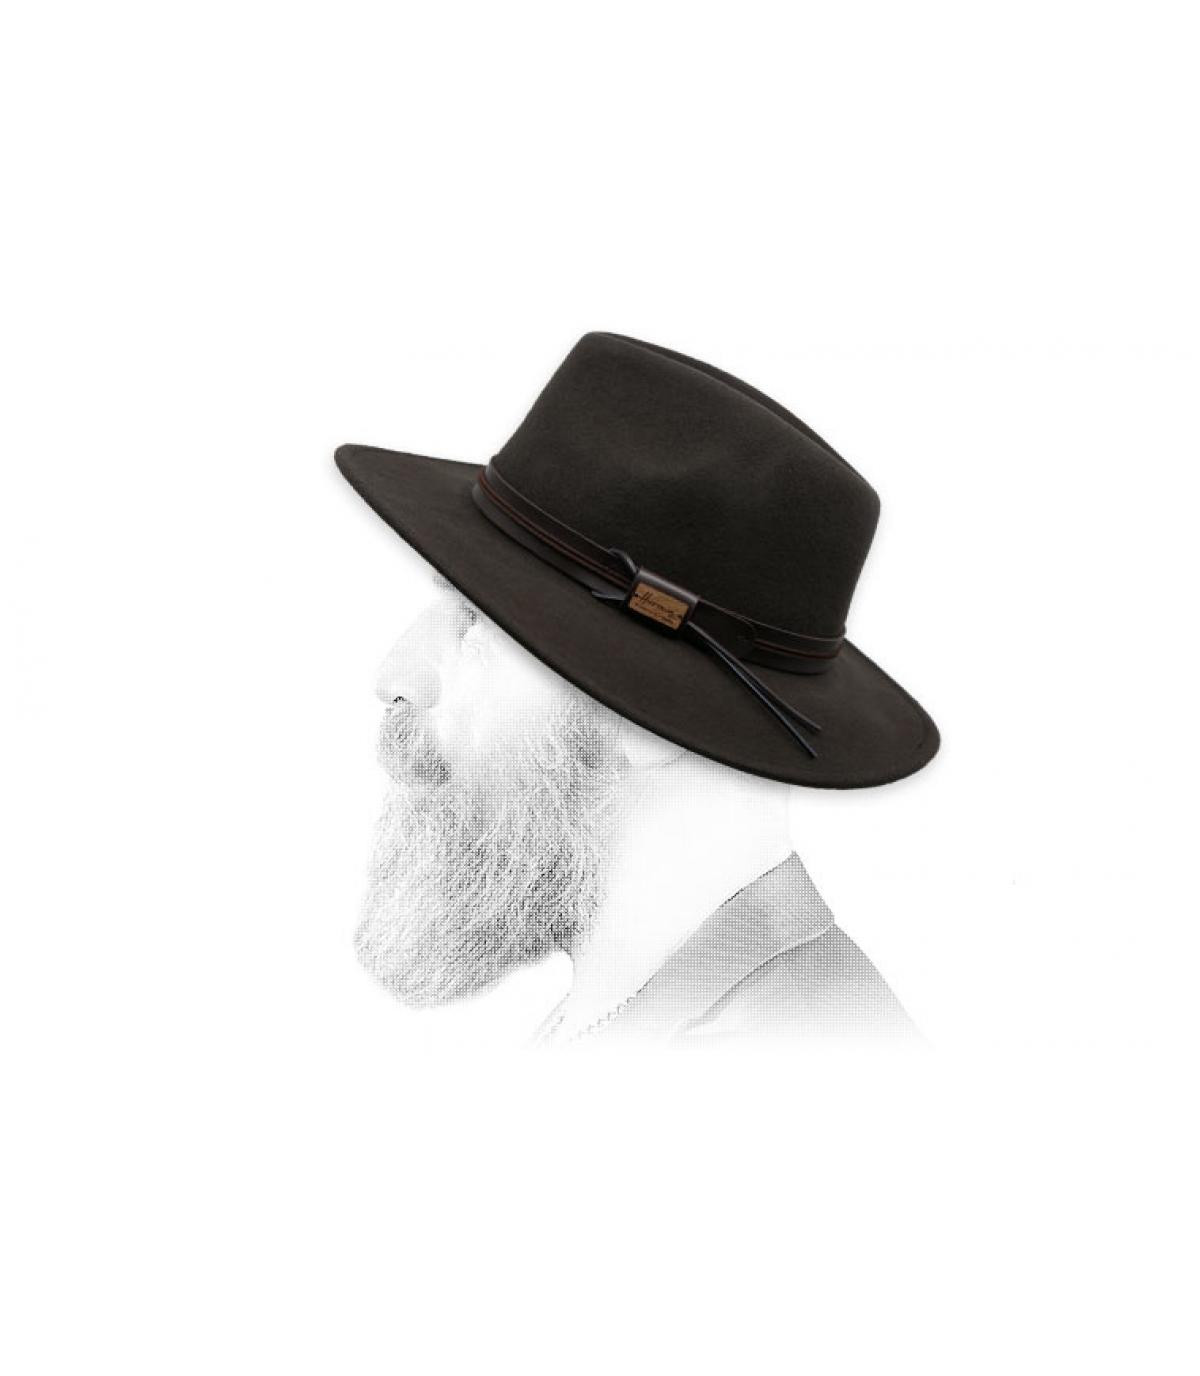 marrón de ala de lana Herman